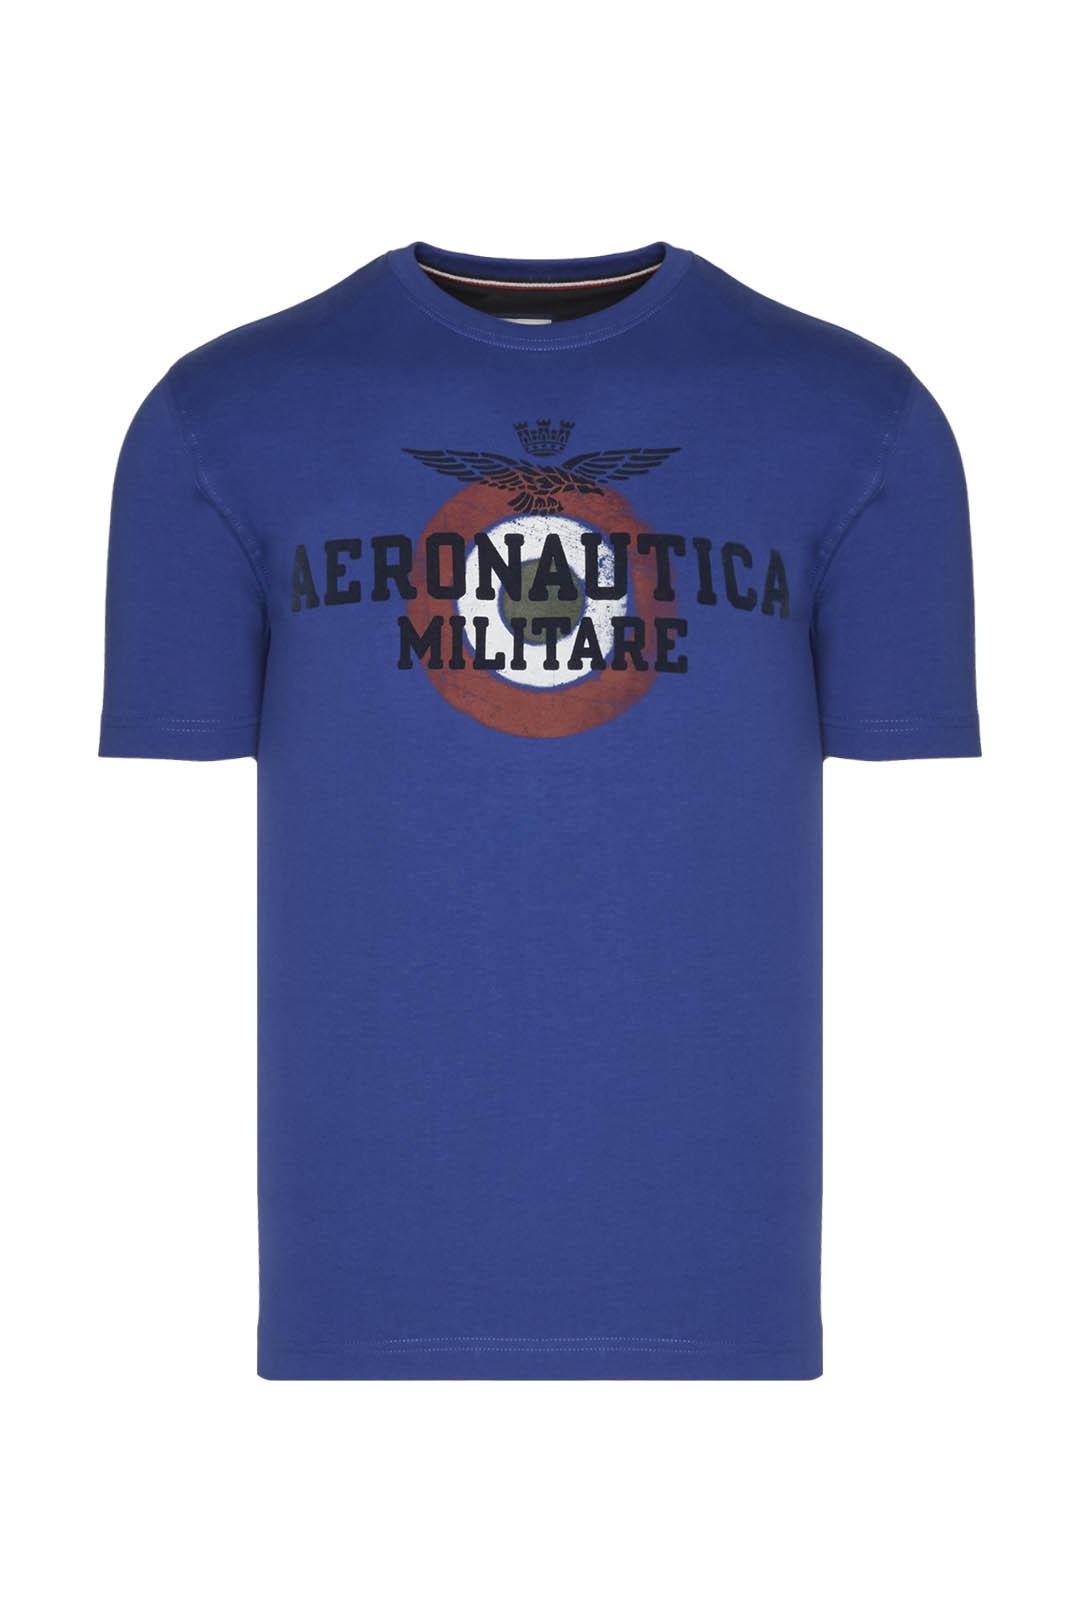 Ikonische Aeronautica Militare T-Shirt